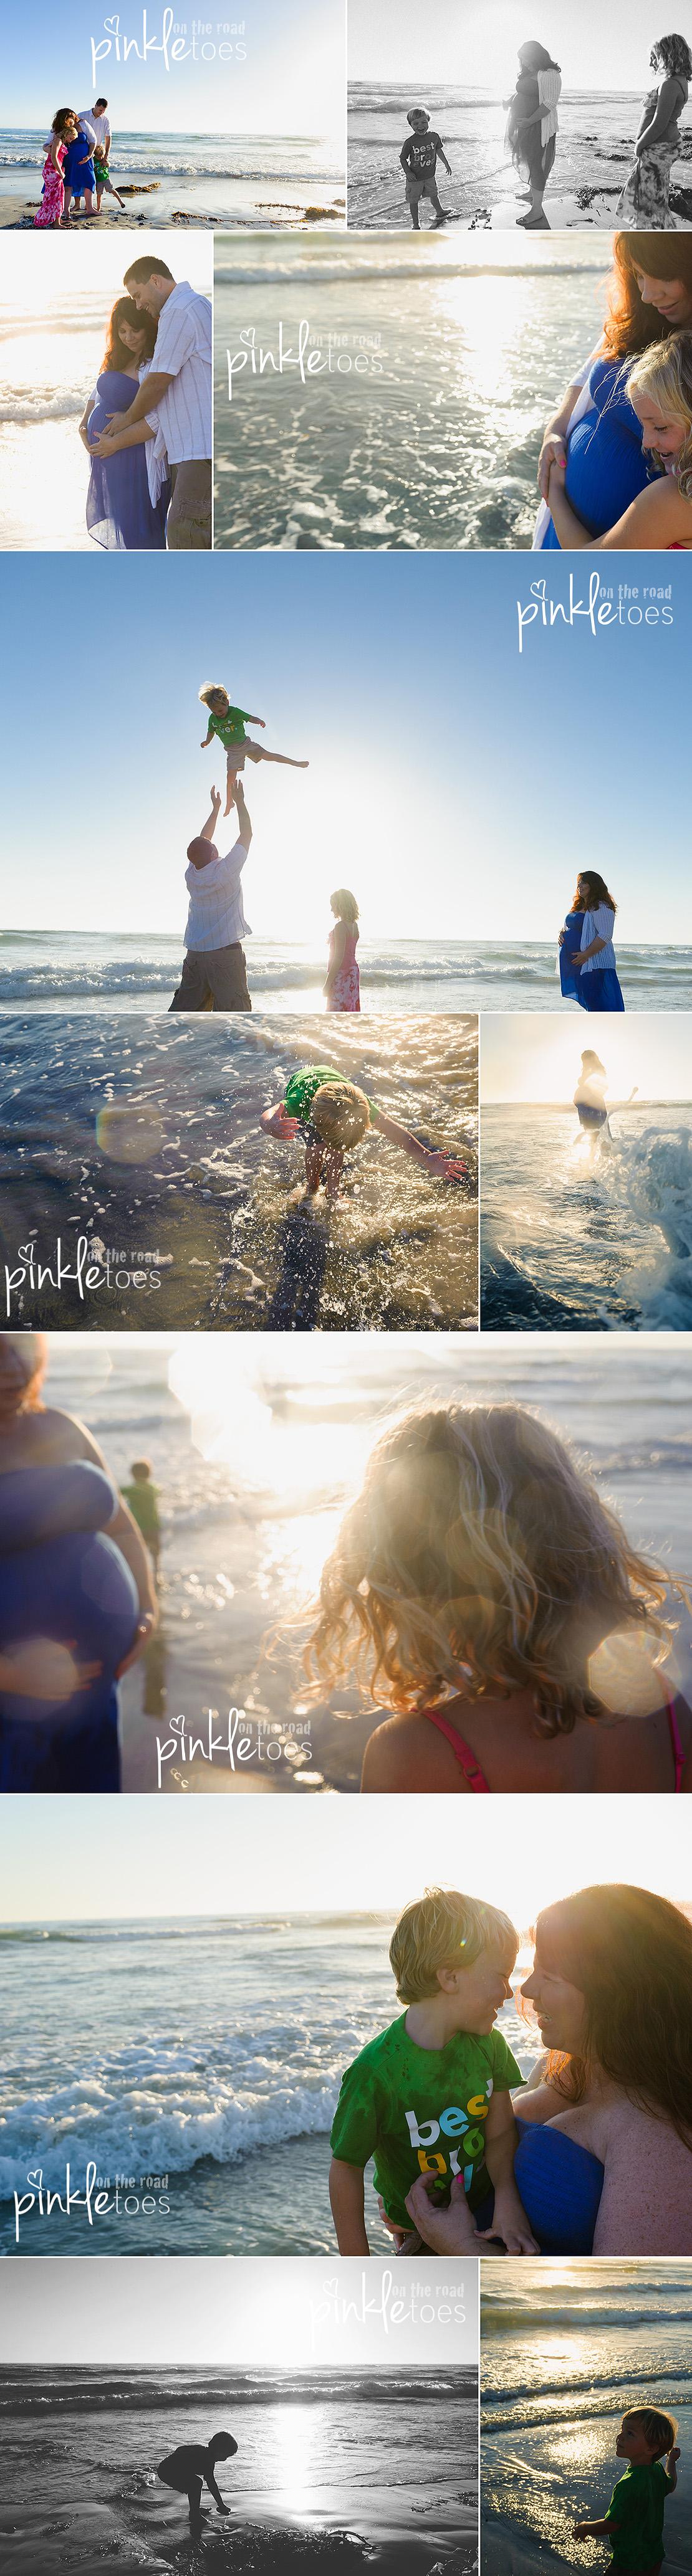 pb-austin-california-maternity-photographer-pregancy-photos-beach-cardiff